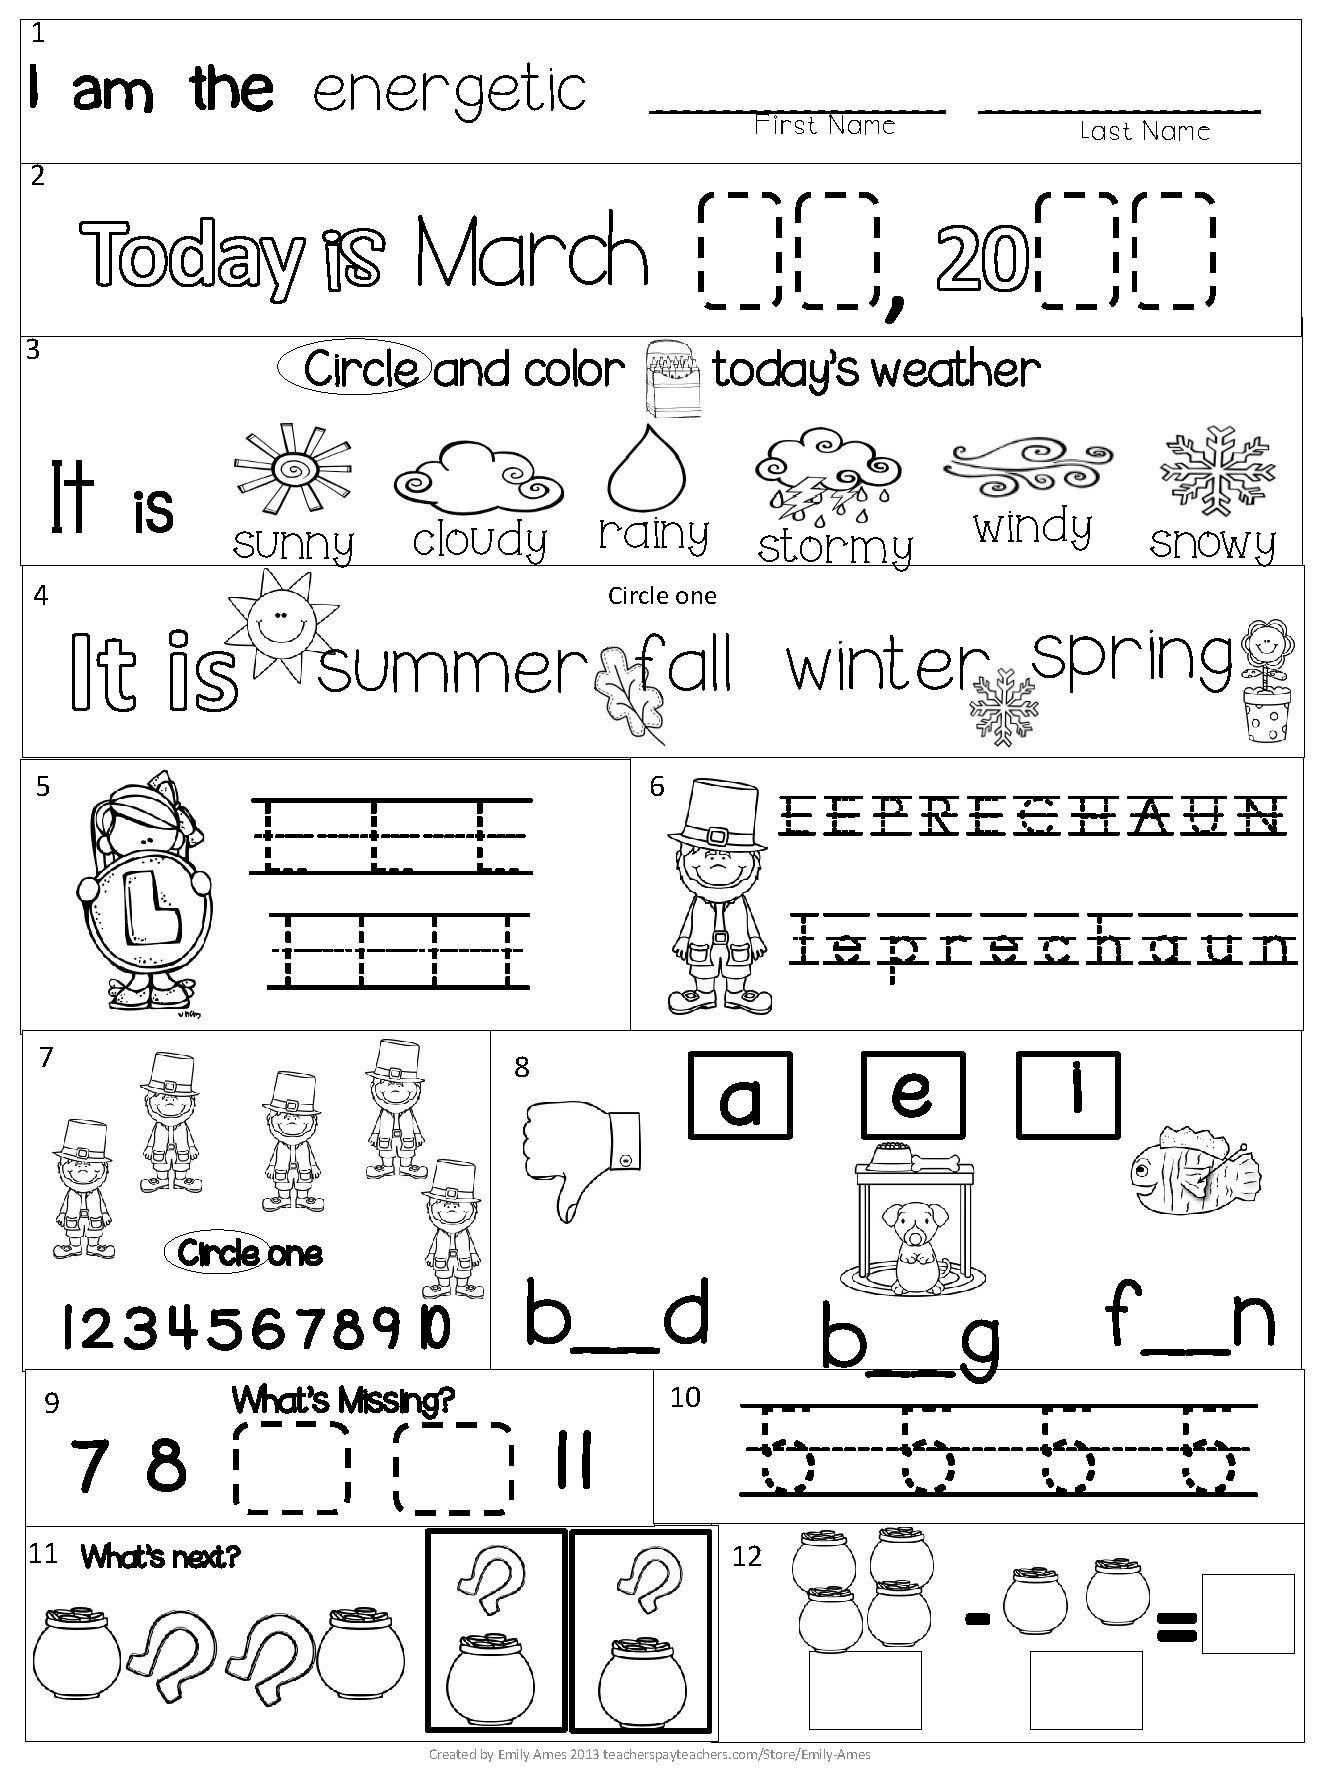 Morning Worksheets For Kindergarten Morning Work Worksheet 4th Kindergarten Morning Work Kindergarten Worksheets Kindergarten Math Worksheets